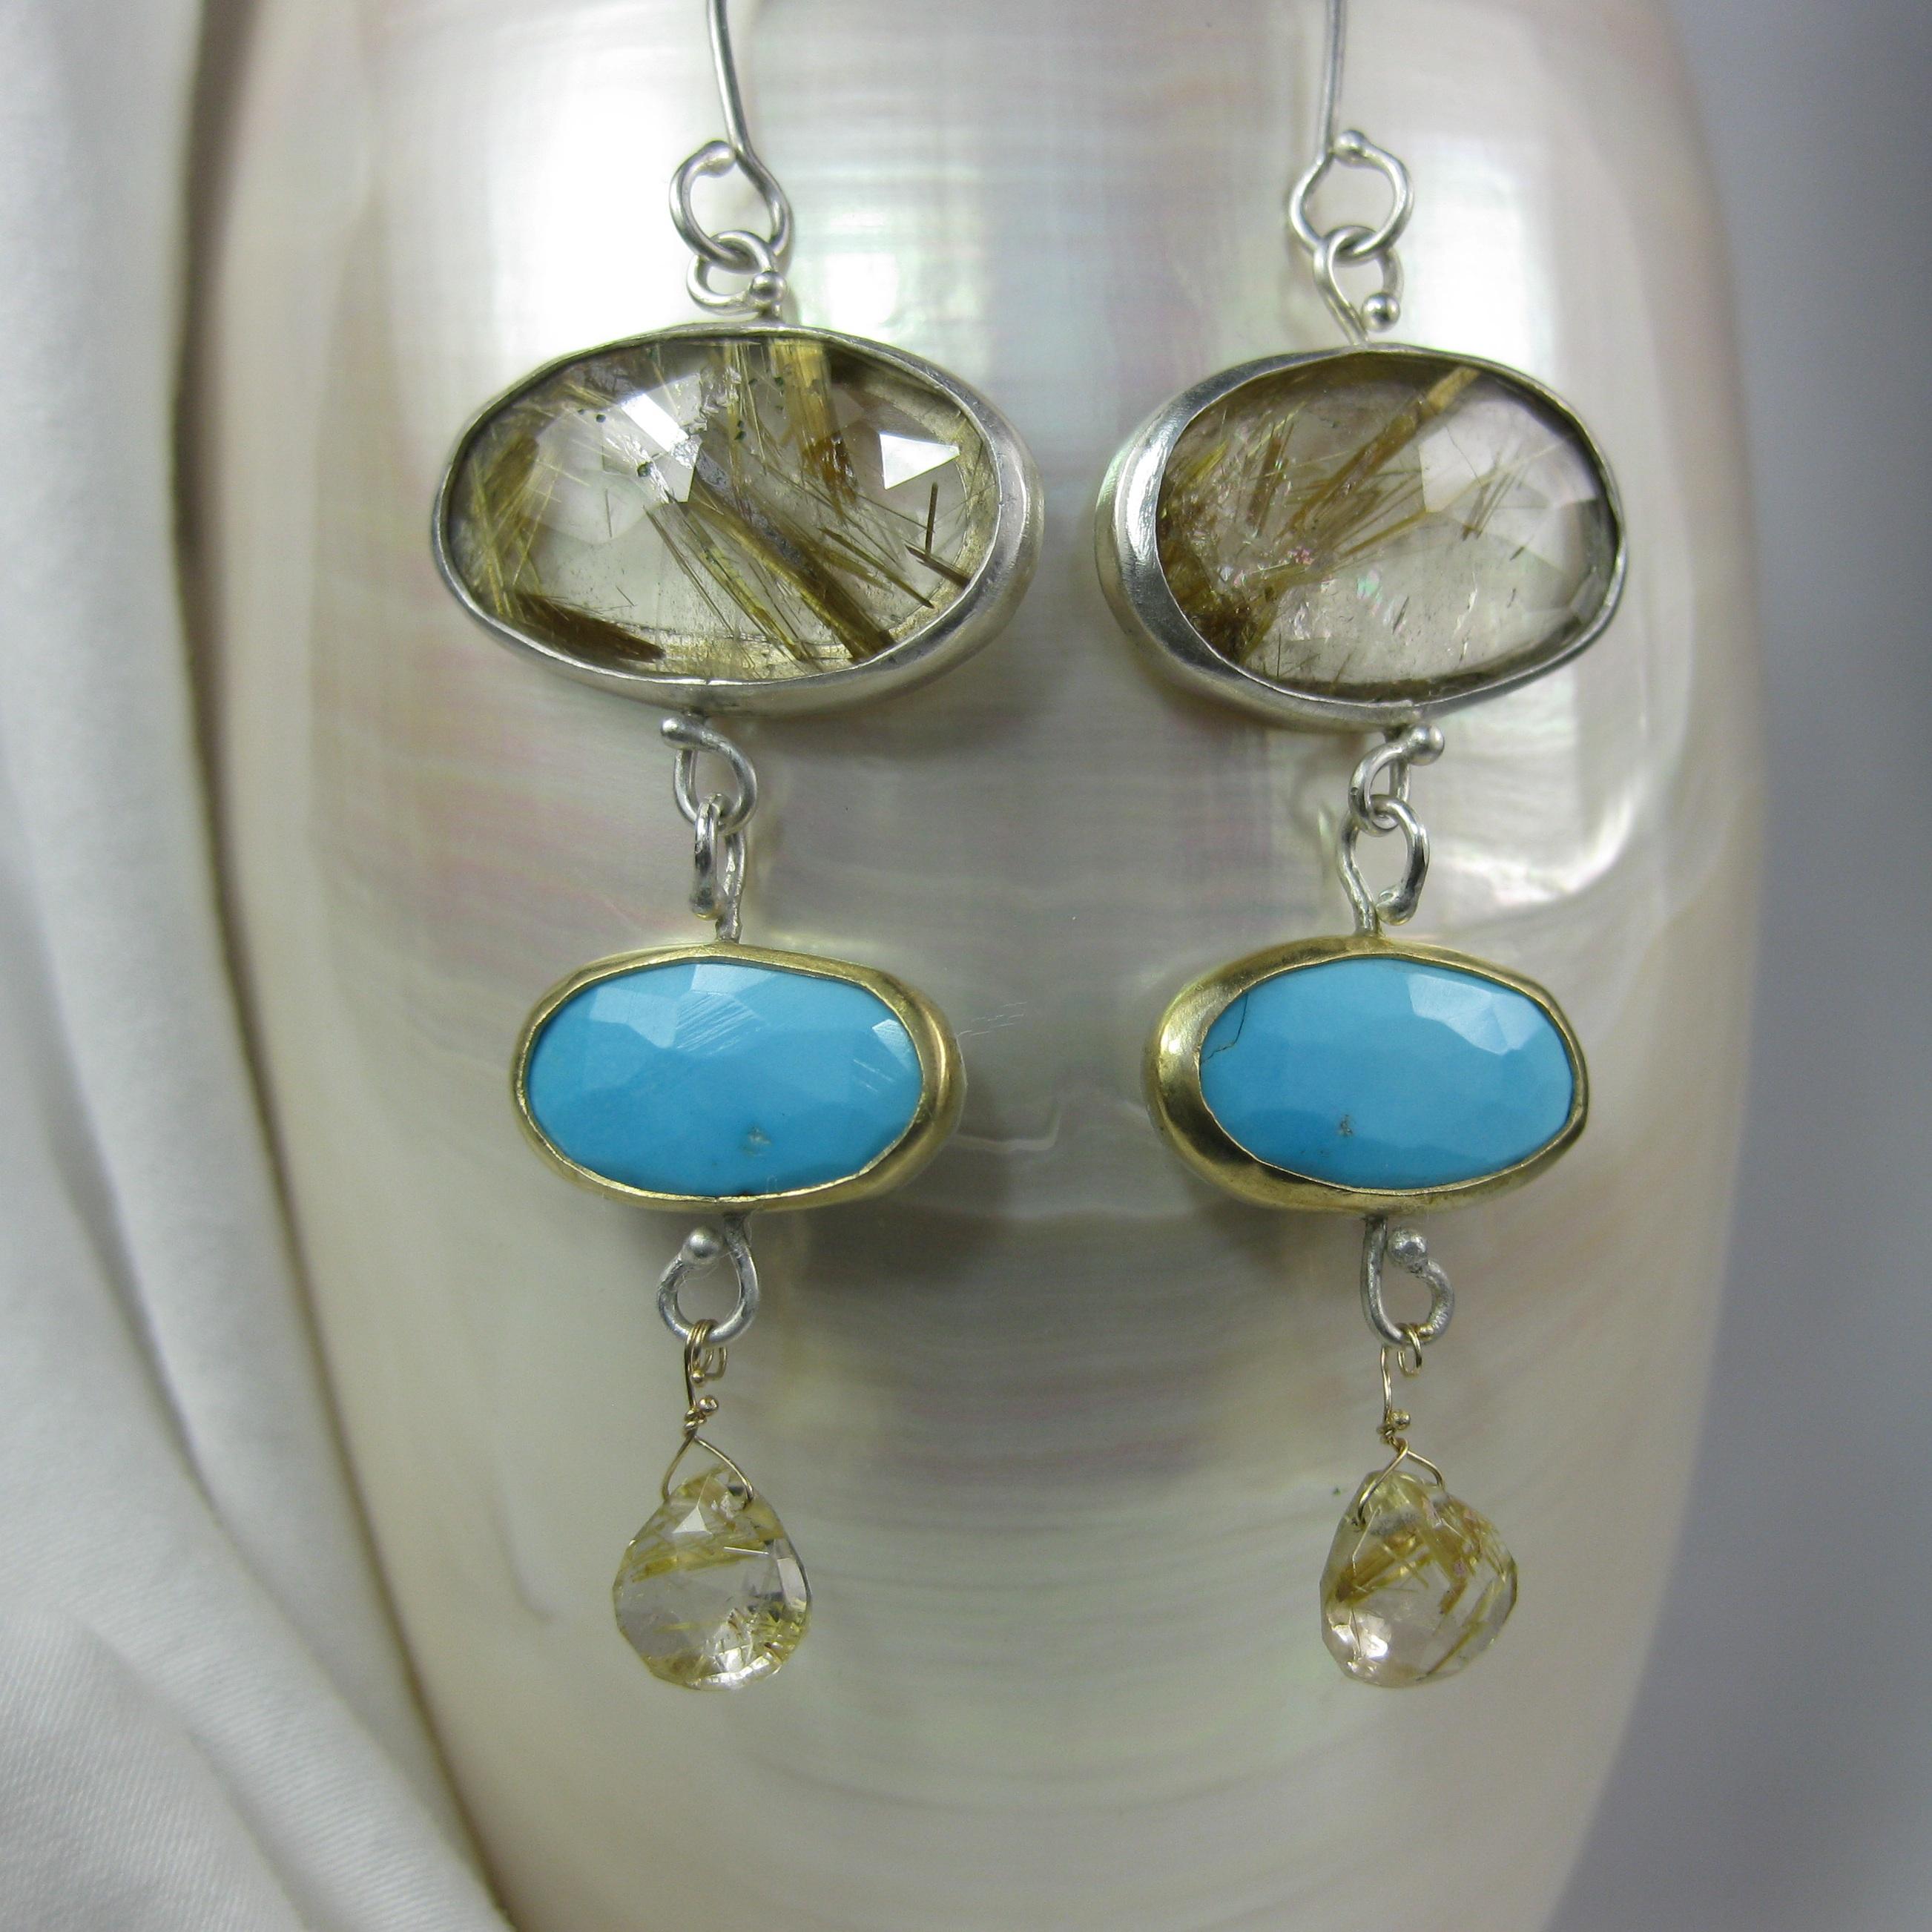 Rose Cut Golden Rutilated Quartz Earrings with Rose Cut Turquoise & Rutile Briolettes